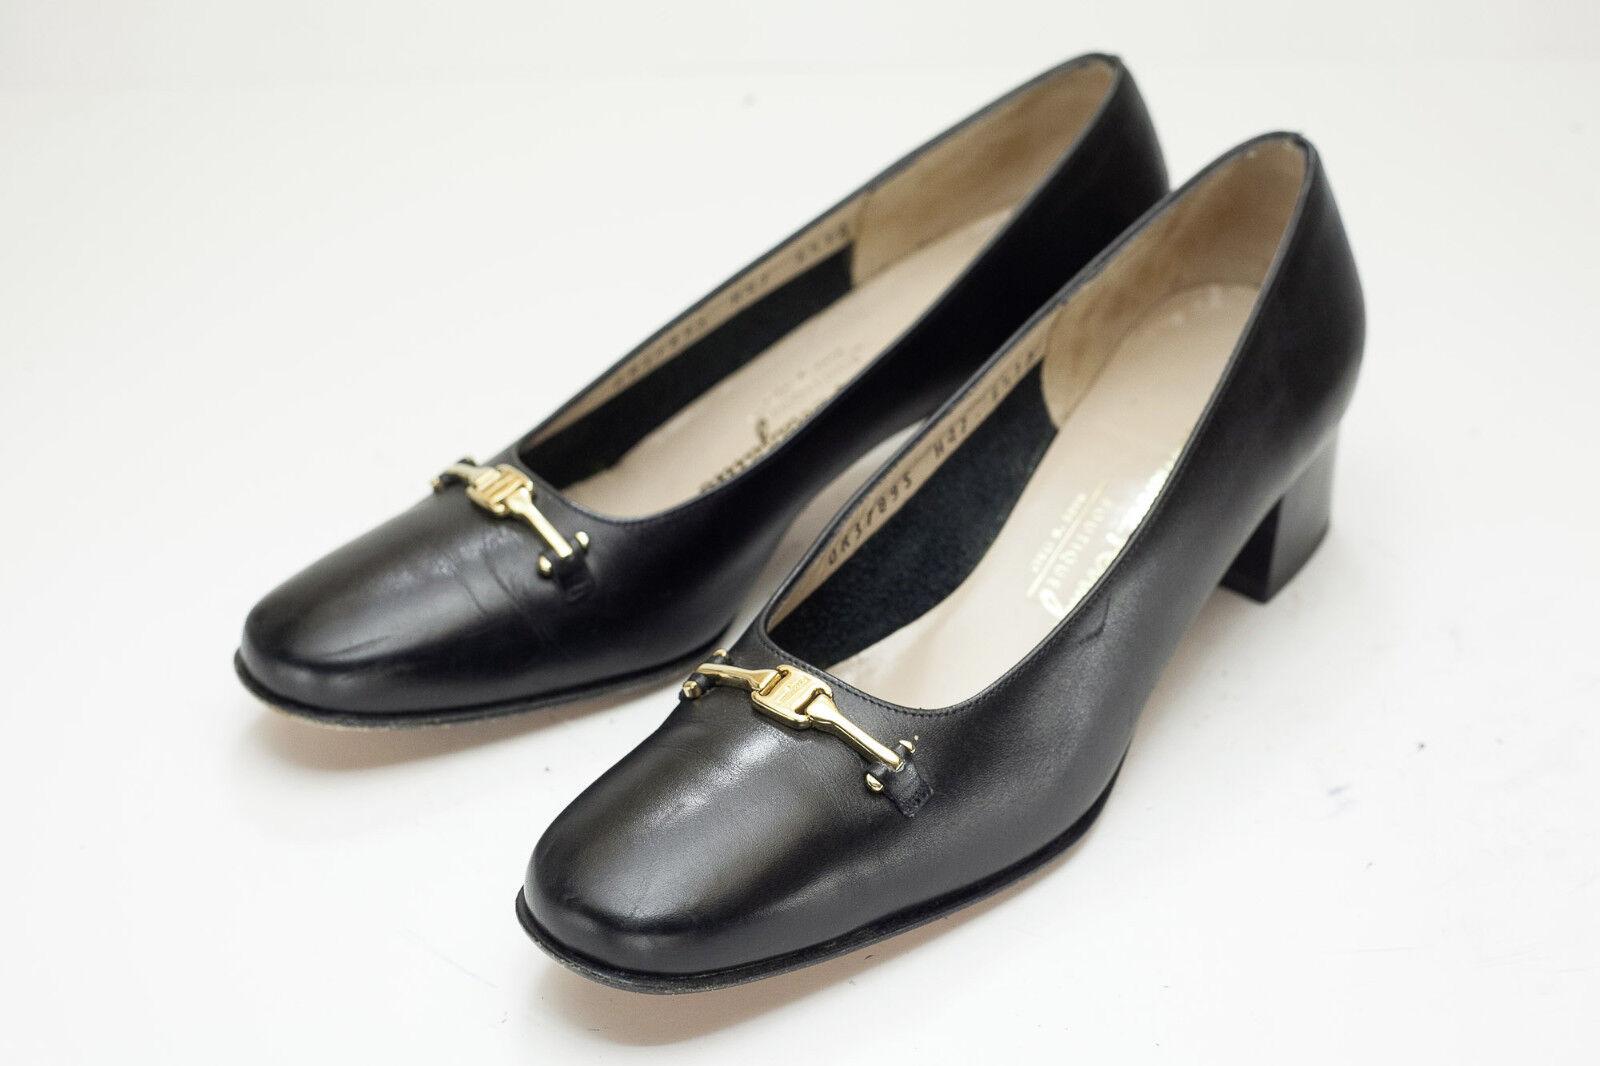 Salvatore Ferragamo 6.5 AAA Black Pumps Shoes Women's Shoes Pumps b24183